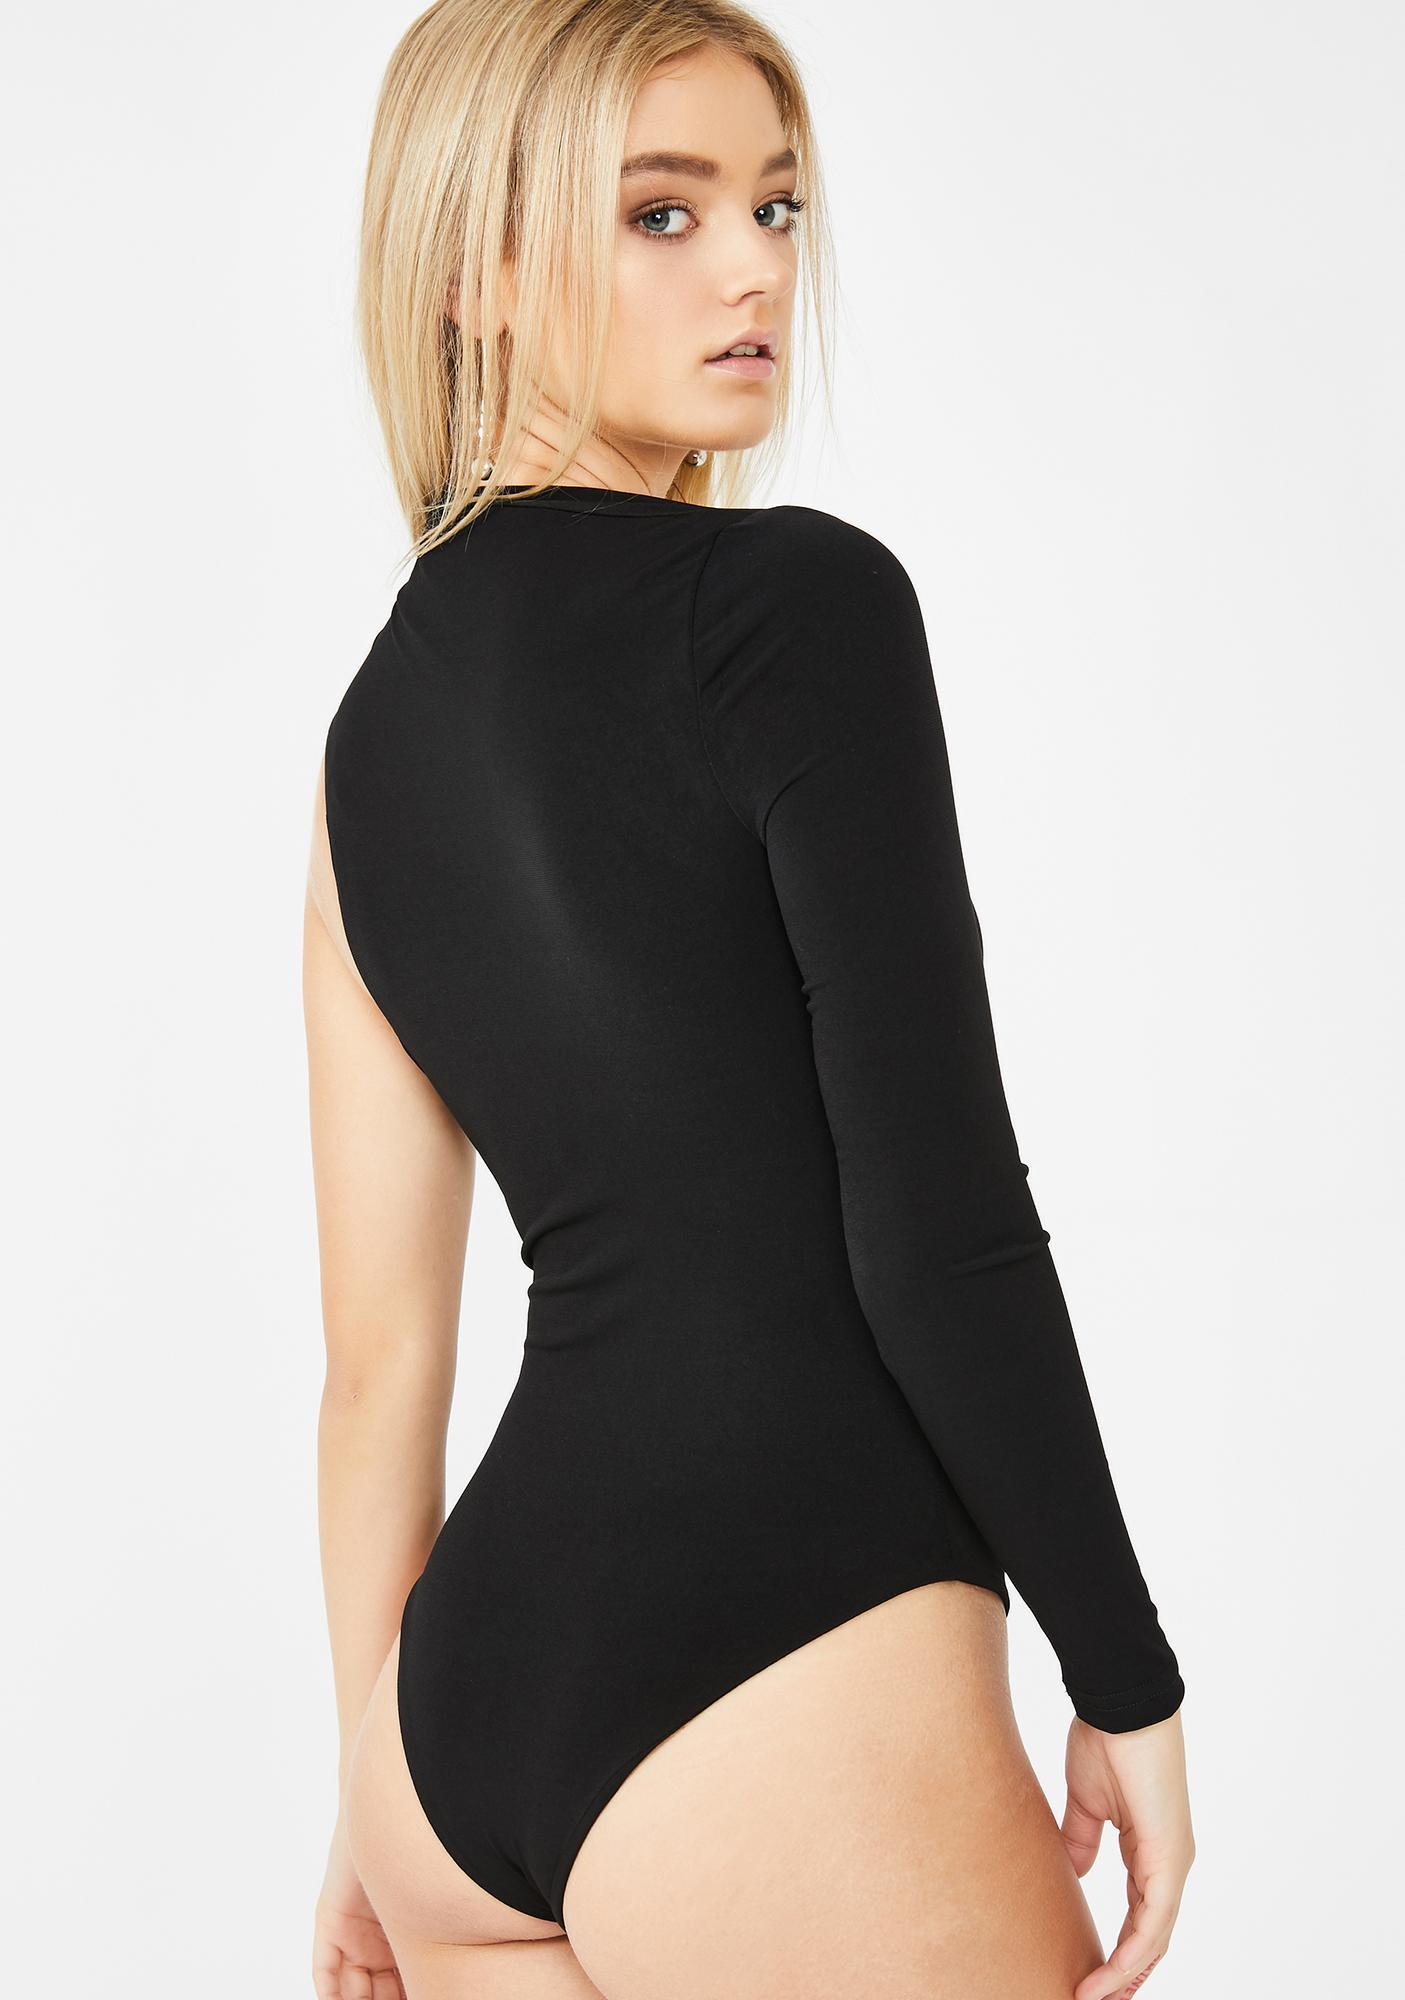 SNDYS. THE LABEL Dany Cut Out Bodysuit